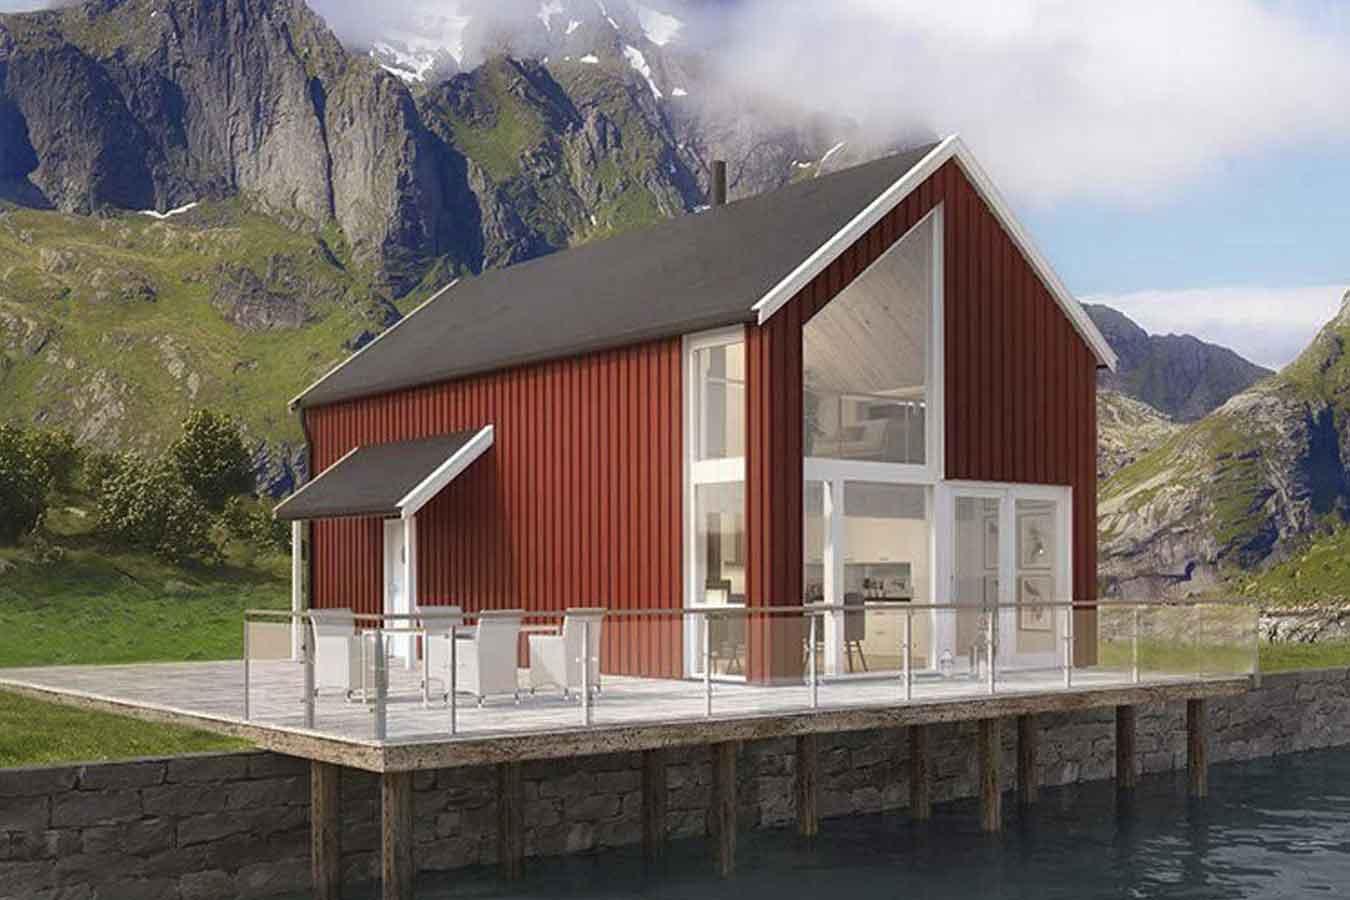 rorbu norgeshus turisme ballstad